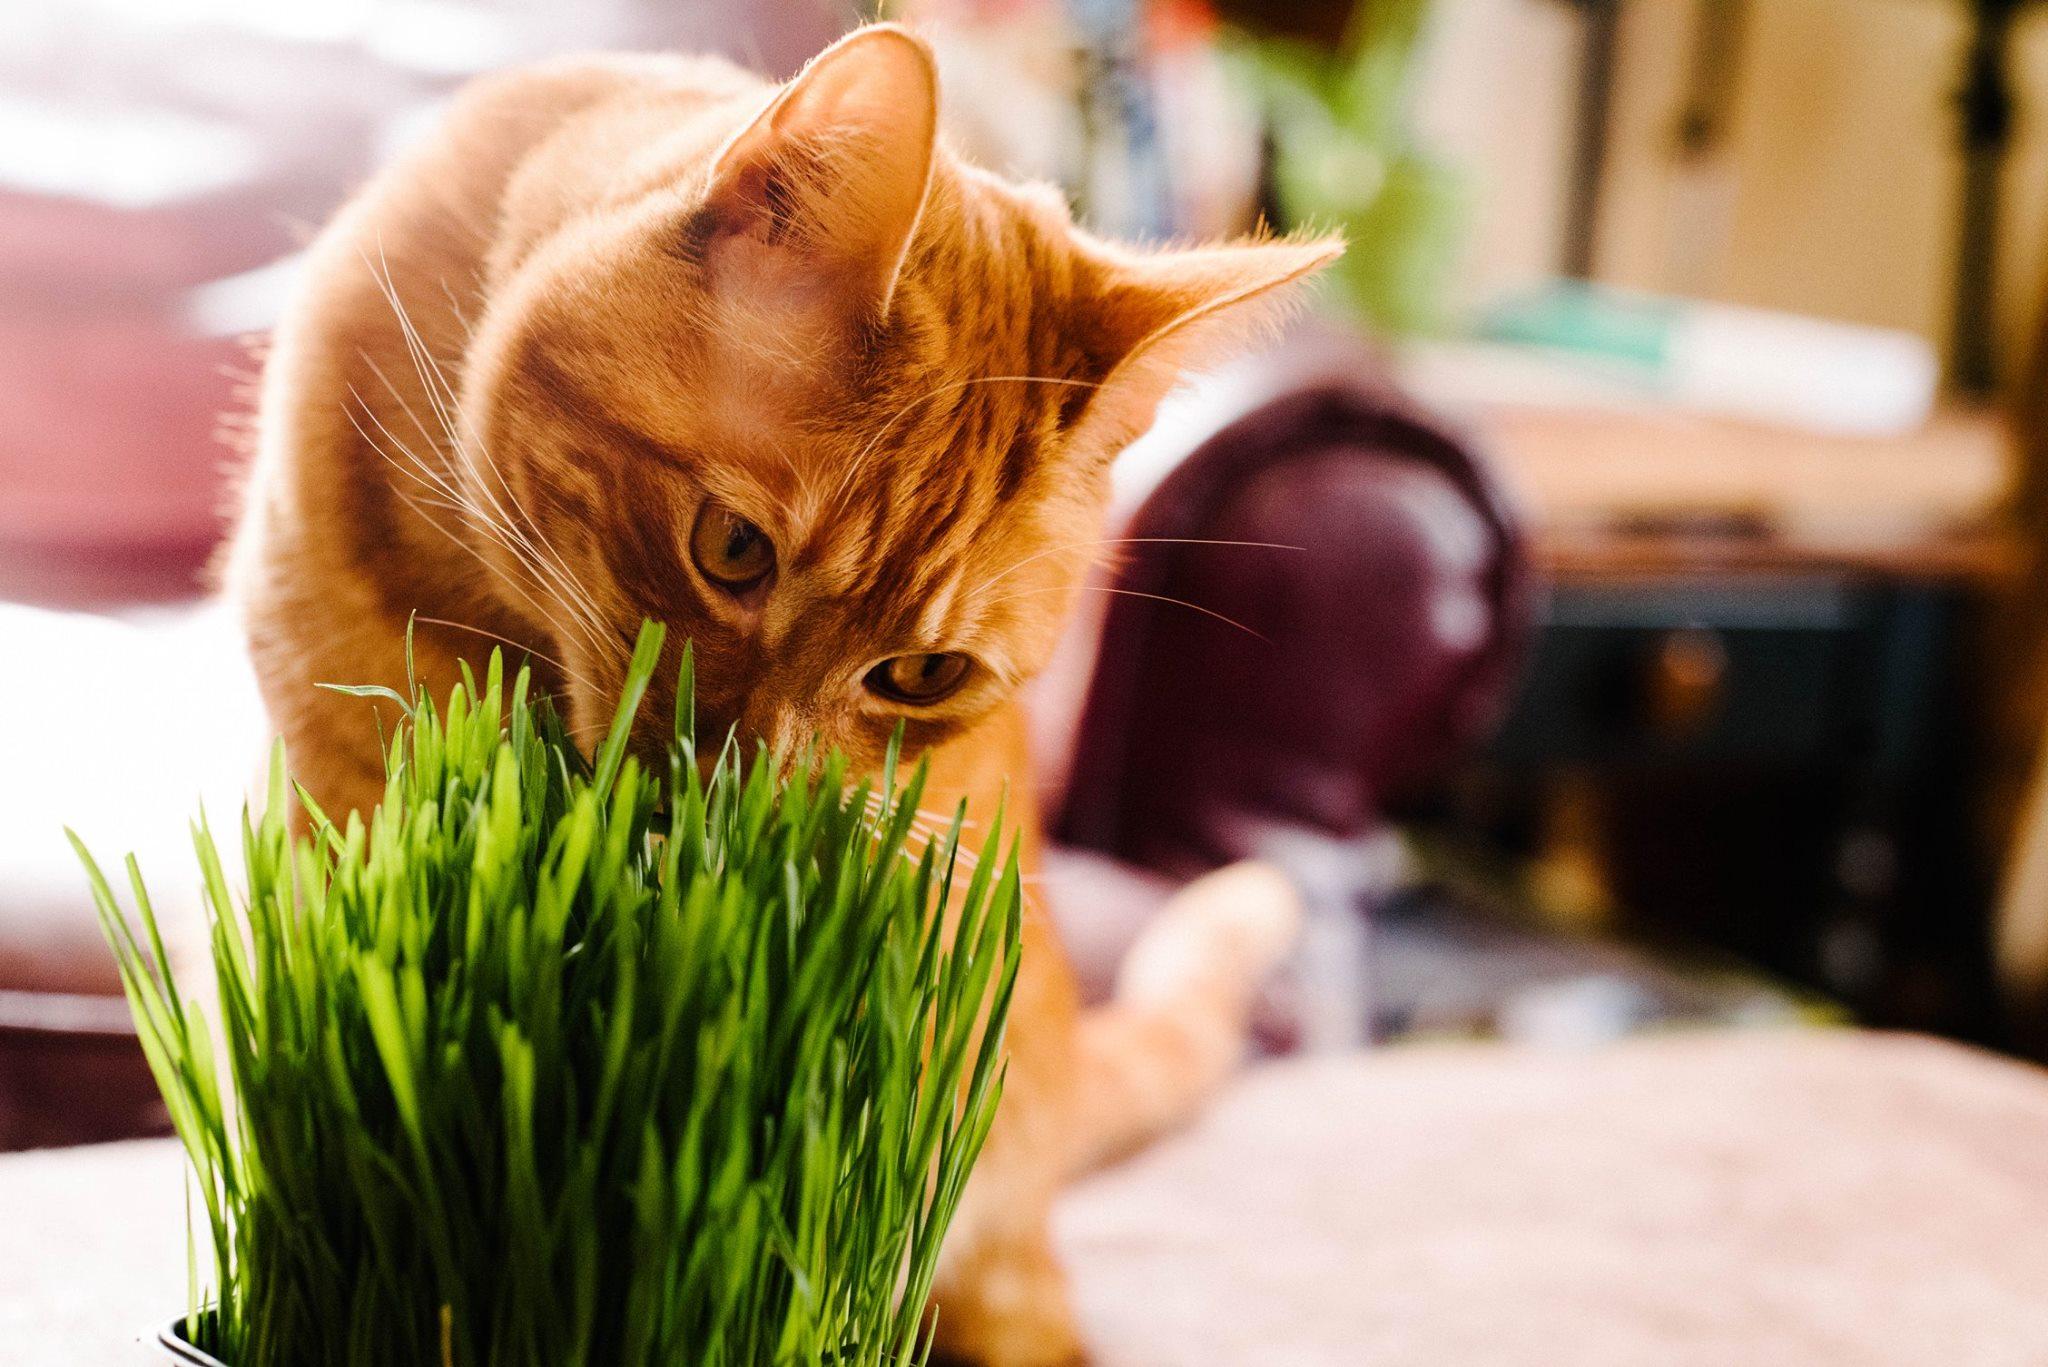 farmersmarketblog-catgrass2.jpg